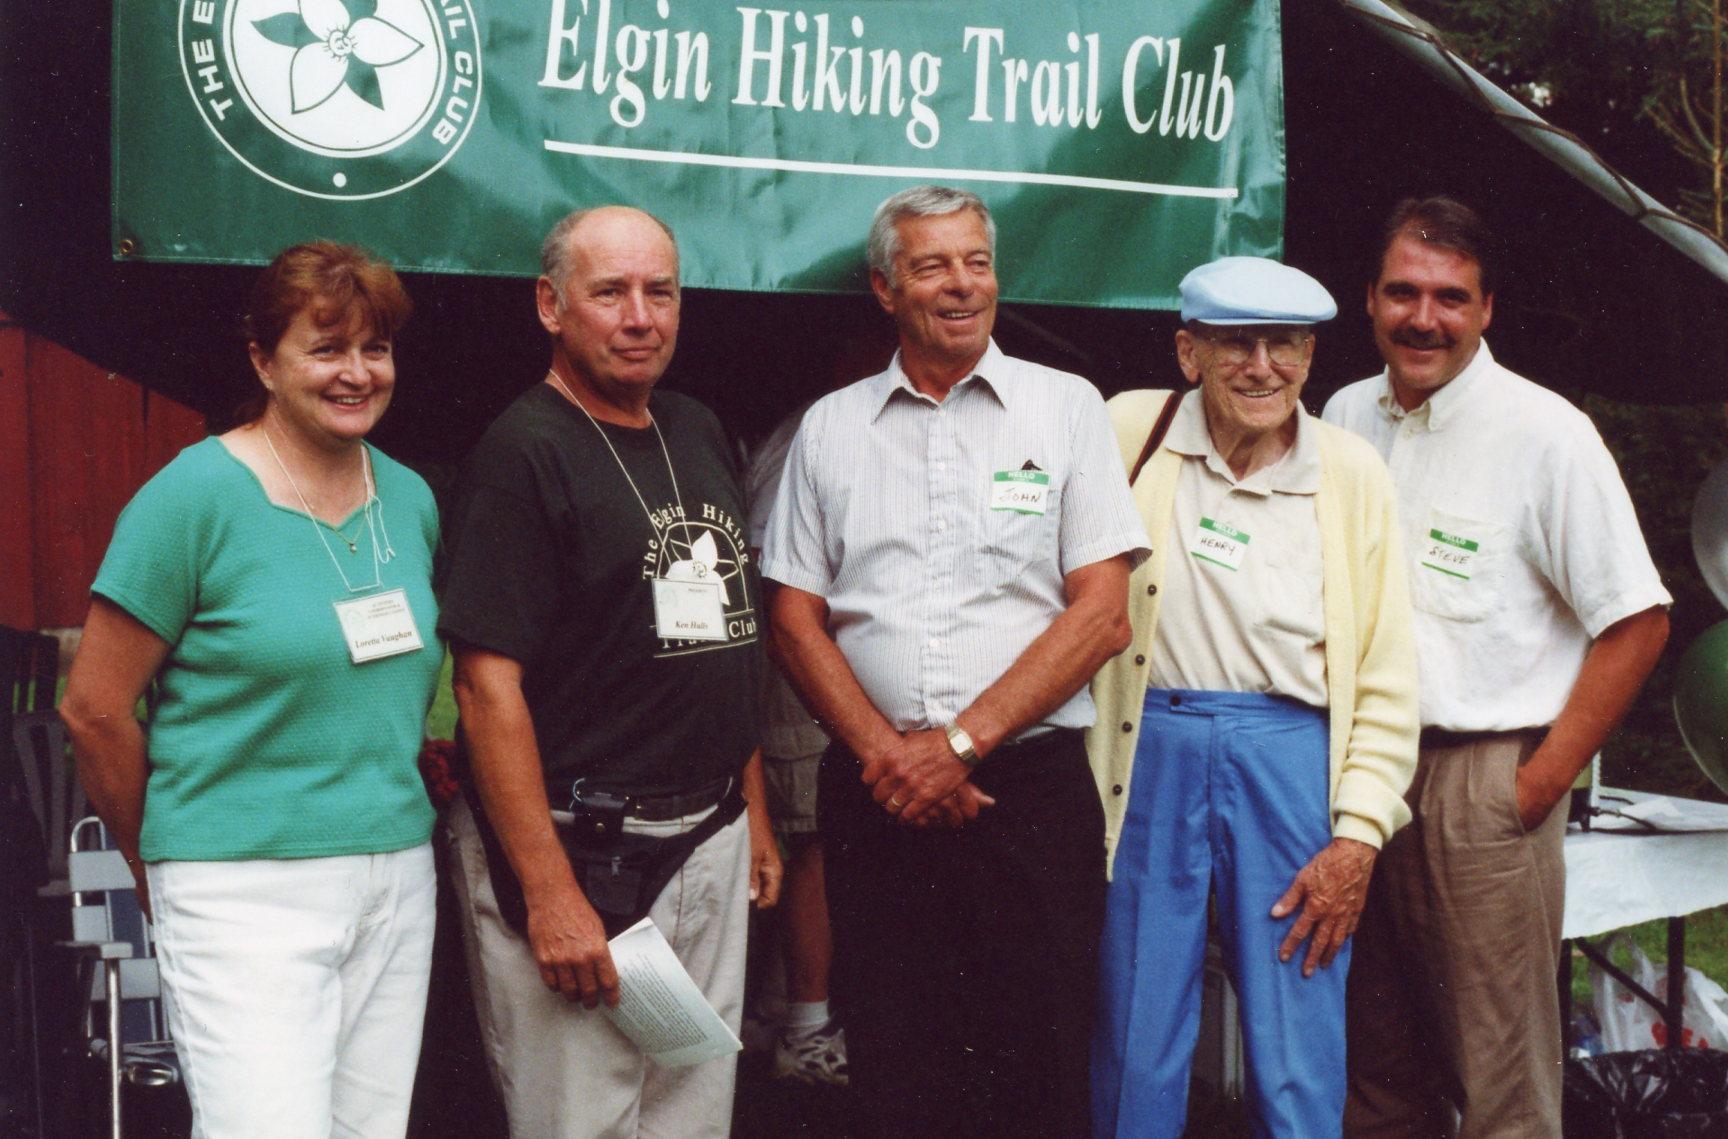 Loretta, Ken Hulls, John Wise, Henry, Steve Peters